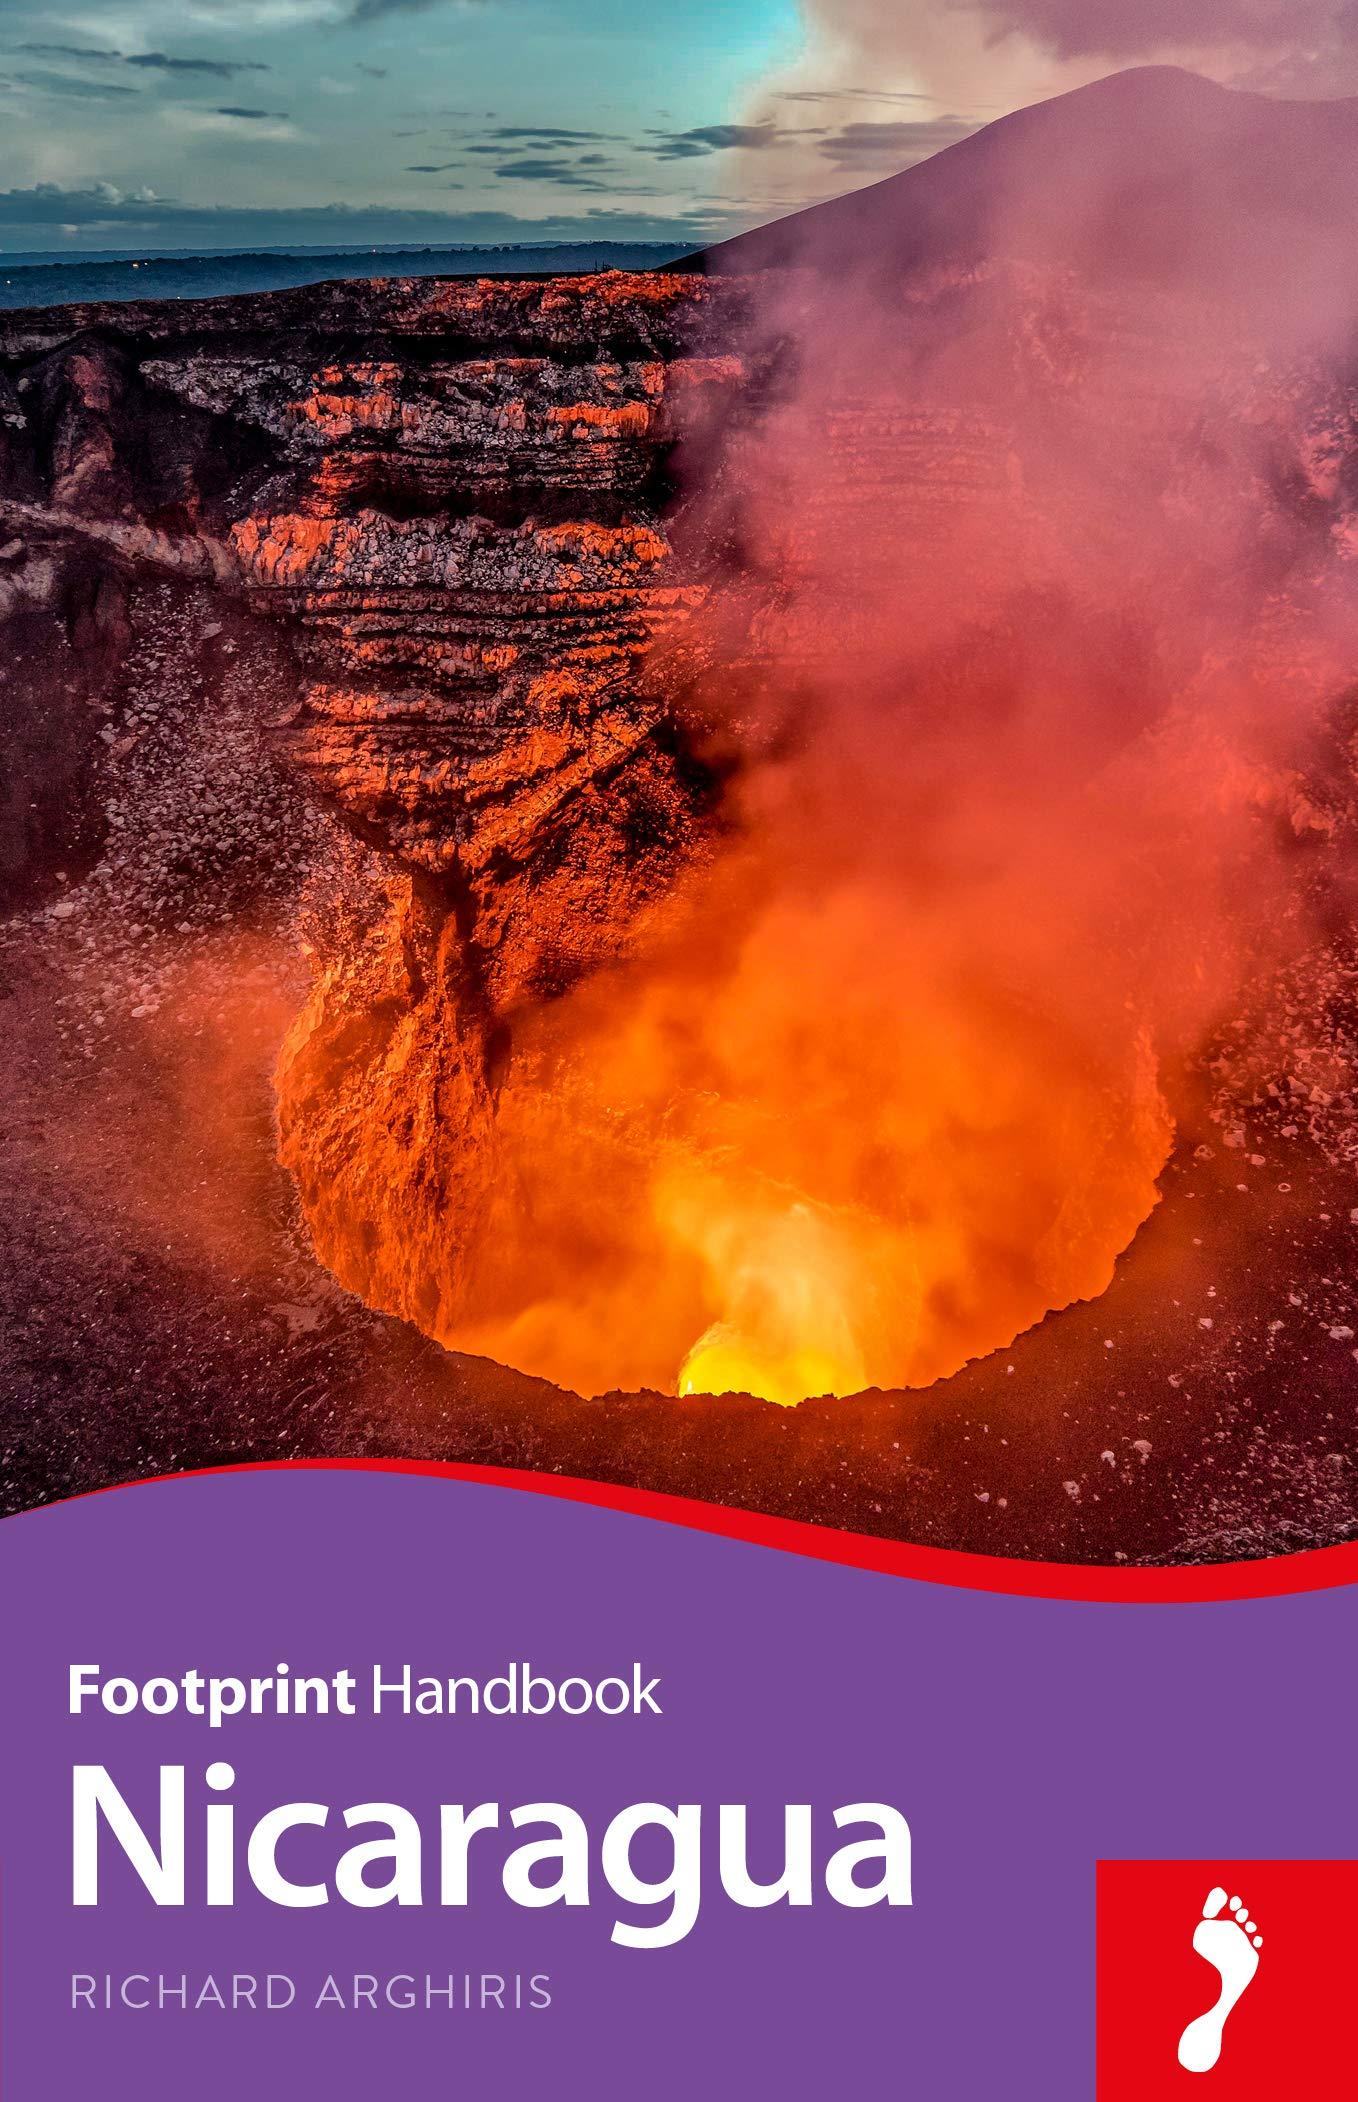 Nicaragua Handbook 9781911082651  Footprint Handbooks   Reisgidsen Overig Midden-Amerika